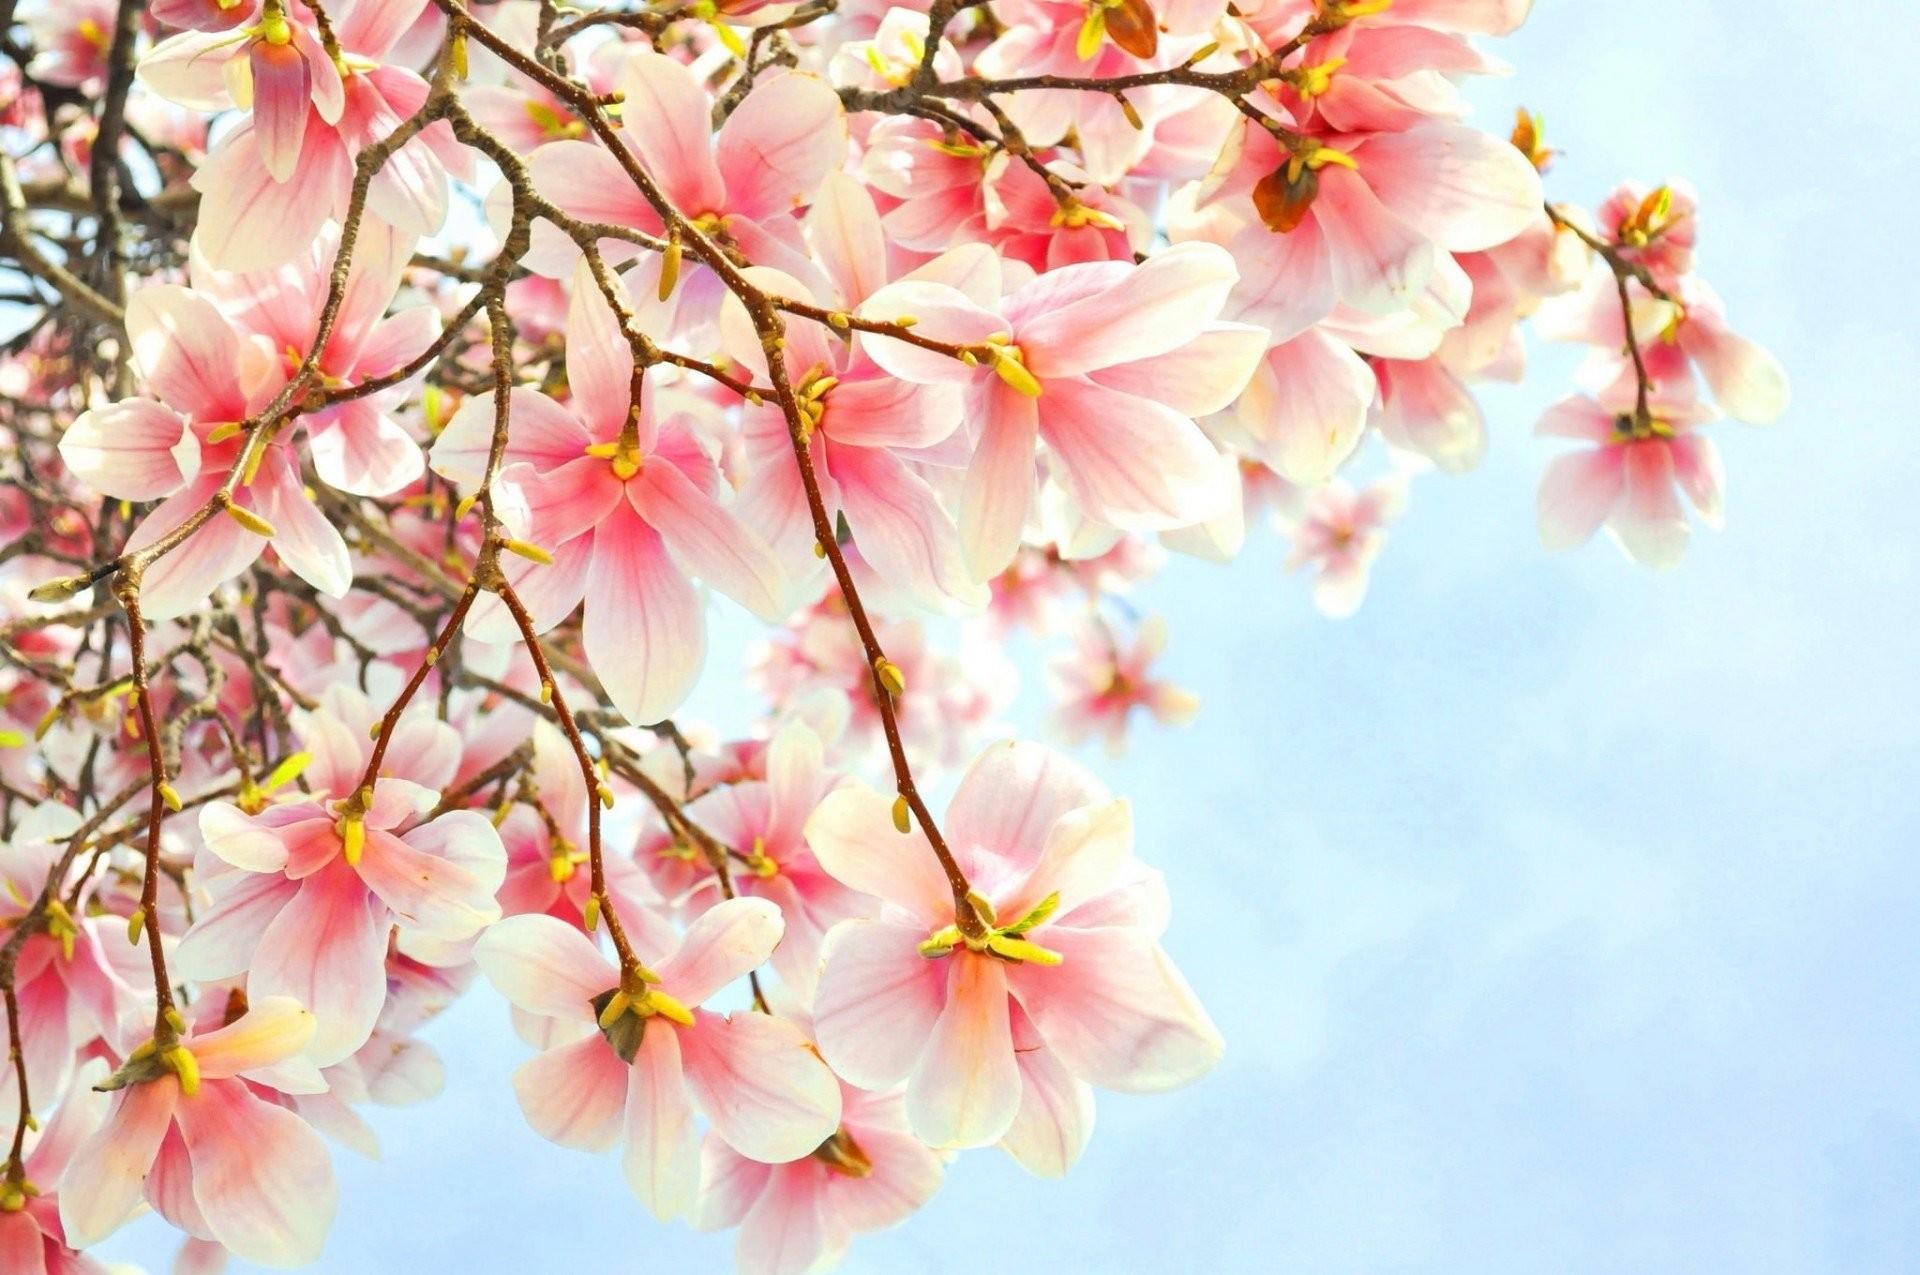 Magnolia Flower Wallpaper 53 Images